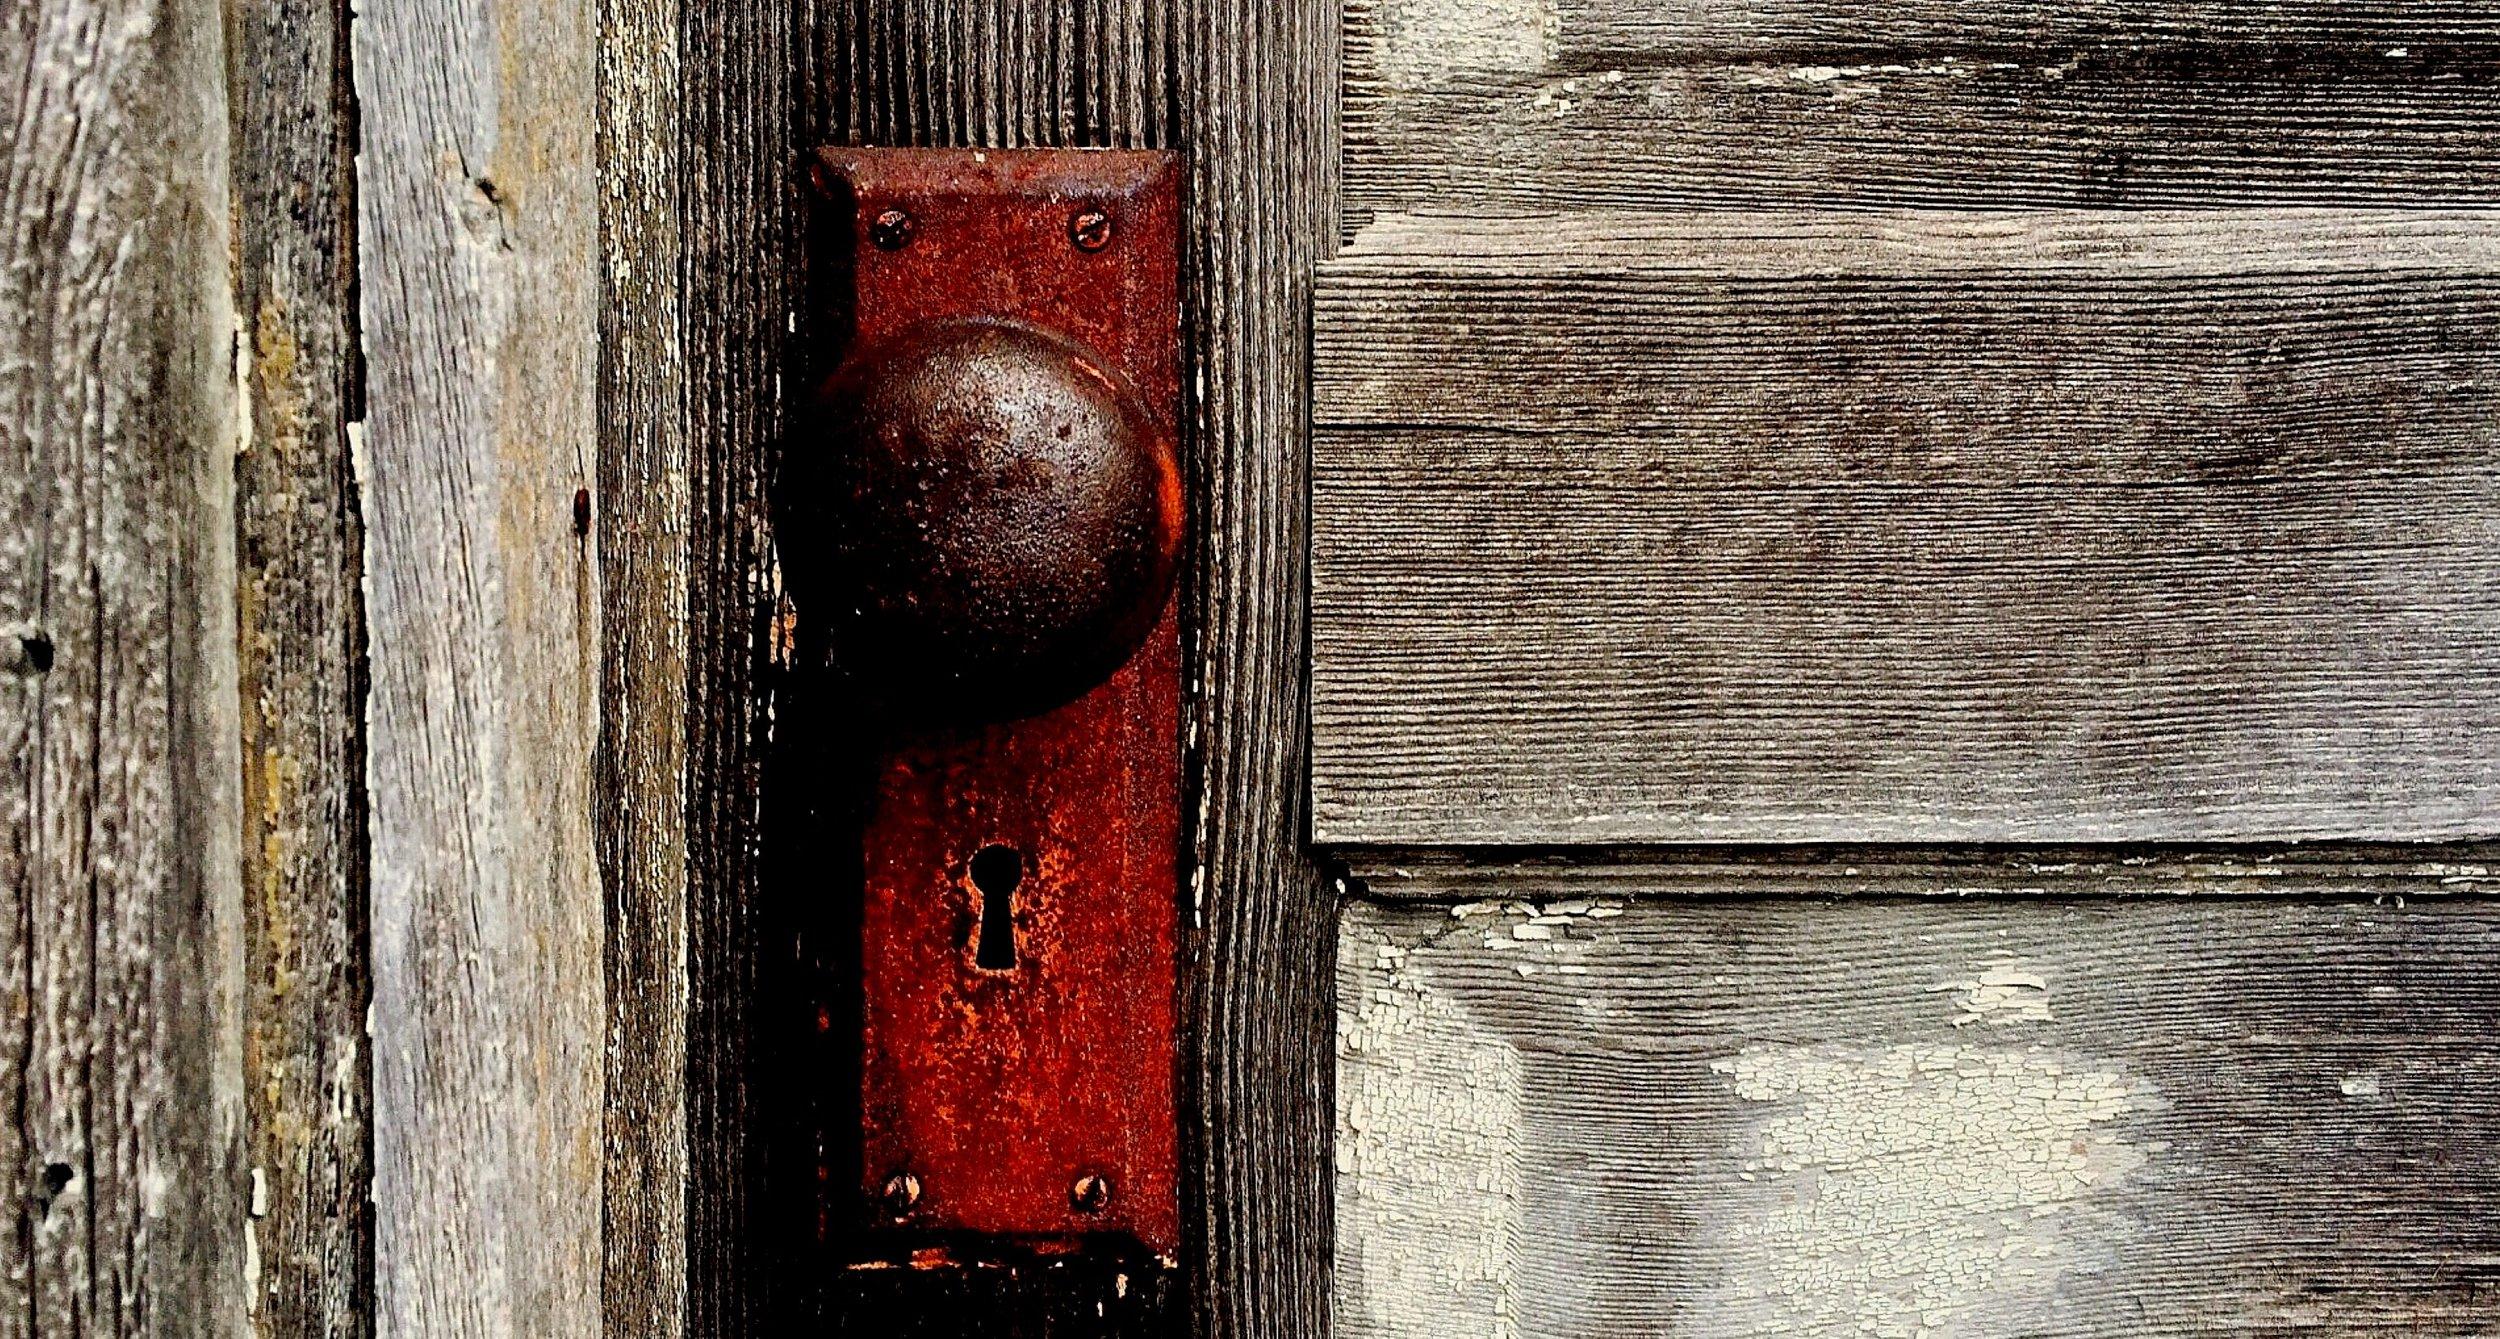 close-up-dirty-door-259832.jpg